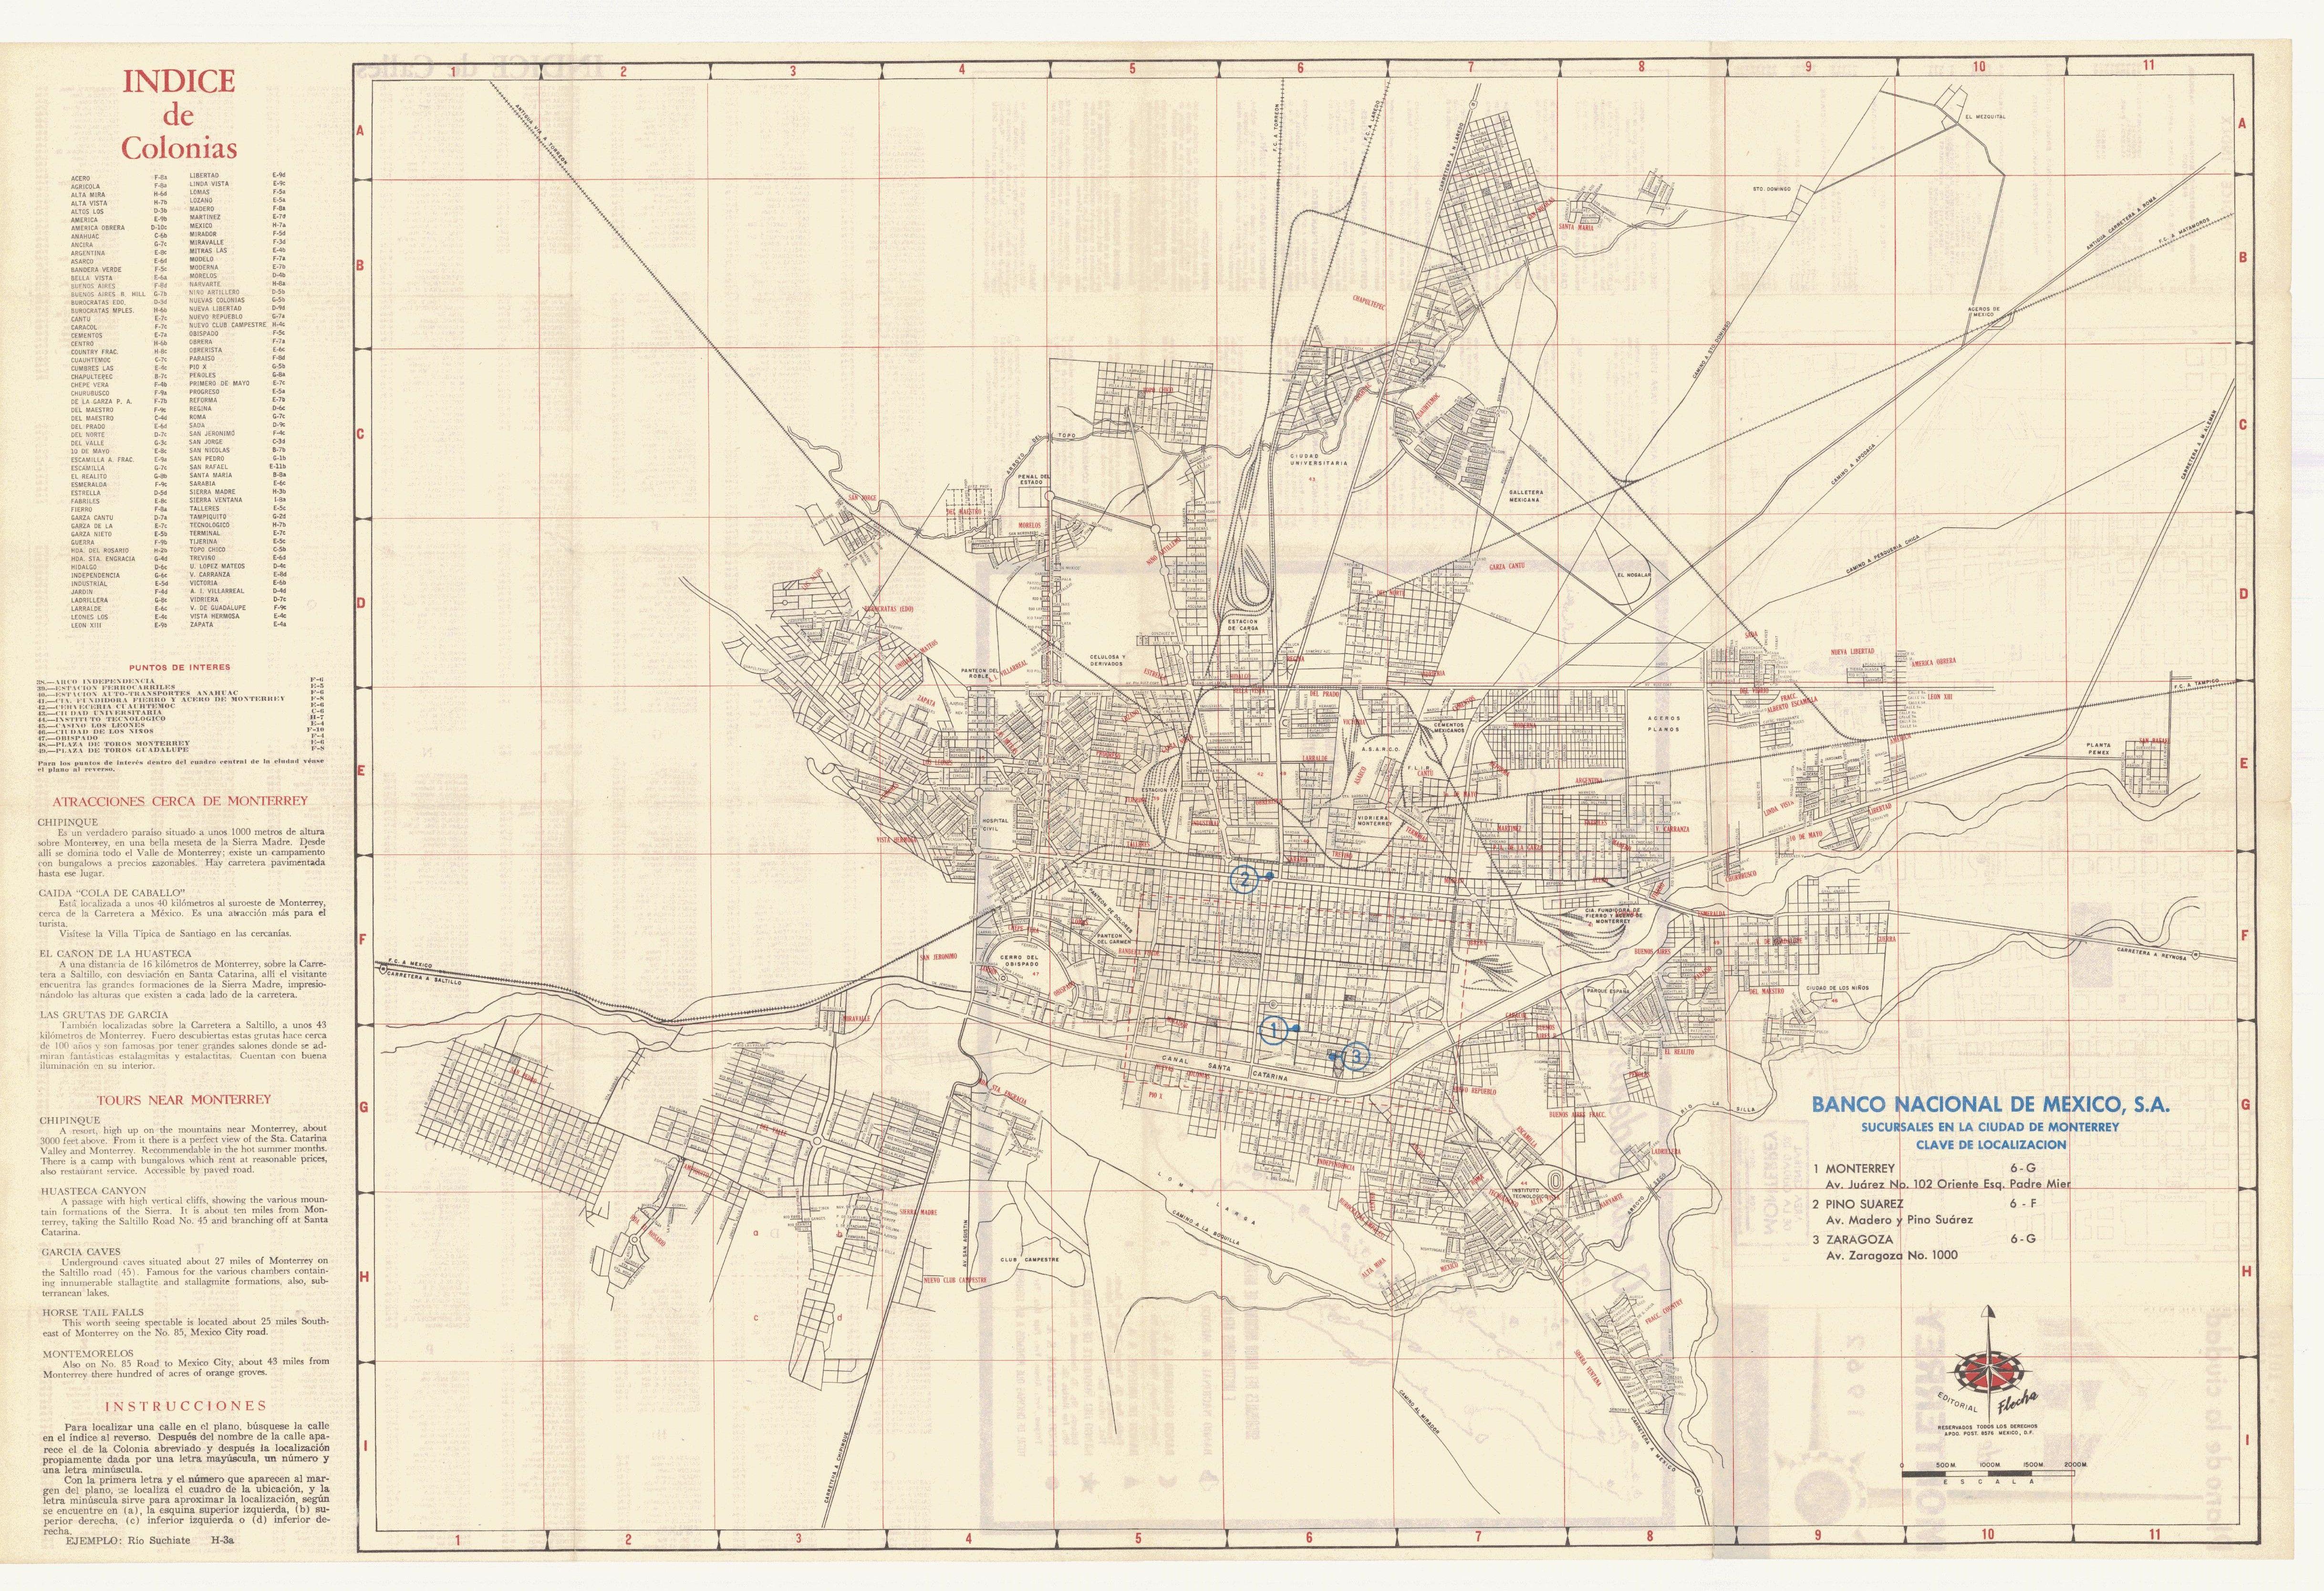 Monterrey Images | Our Top 301 Monterrey Stock Photos ... |Old Monterrey Mexico Map